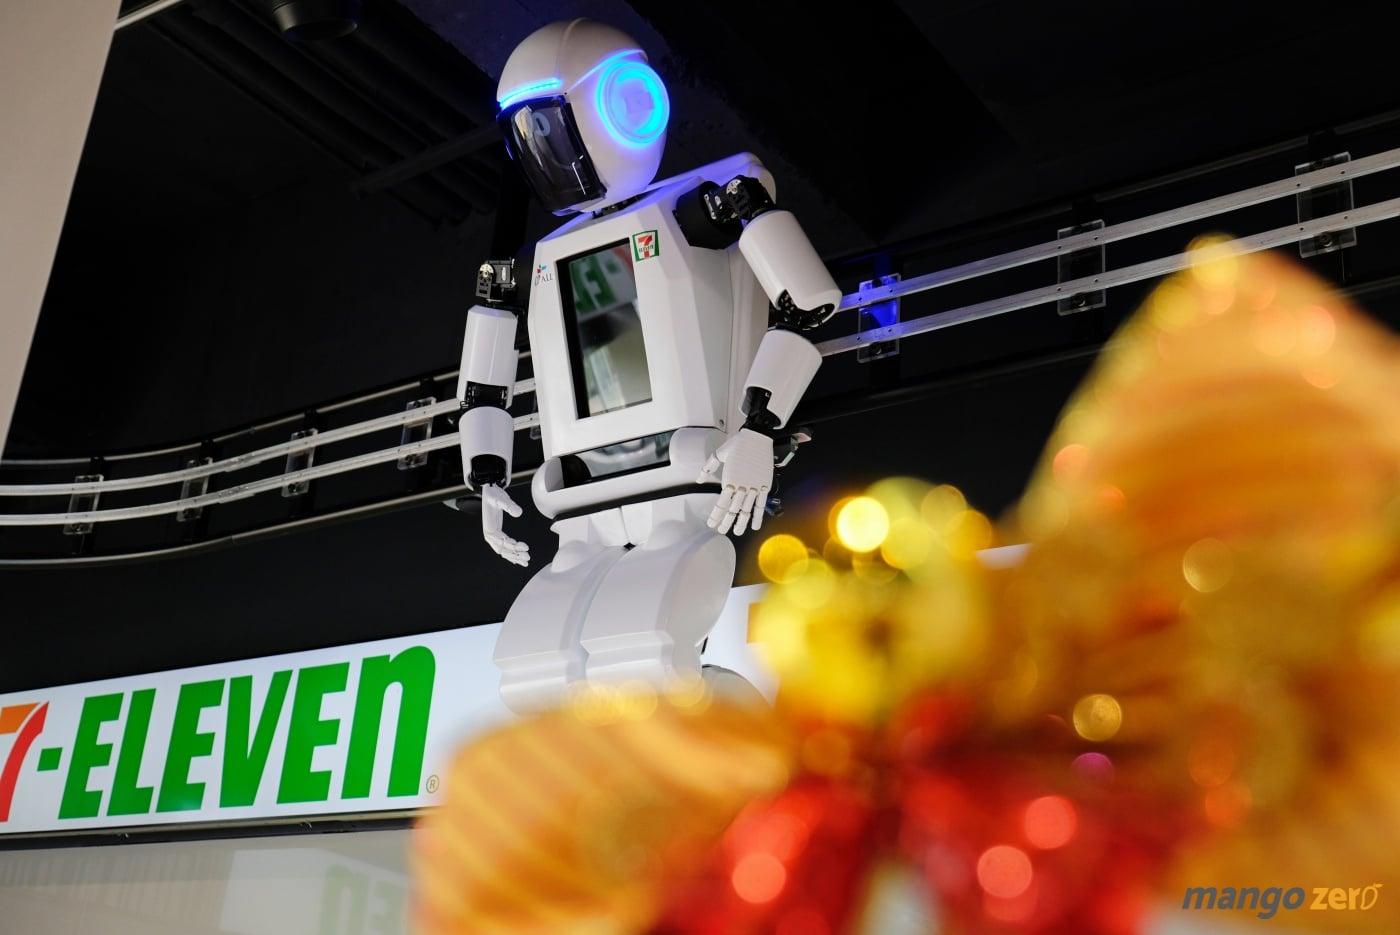 7-eleven-flagship-store-pim-24